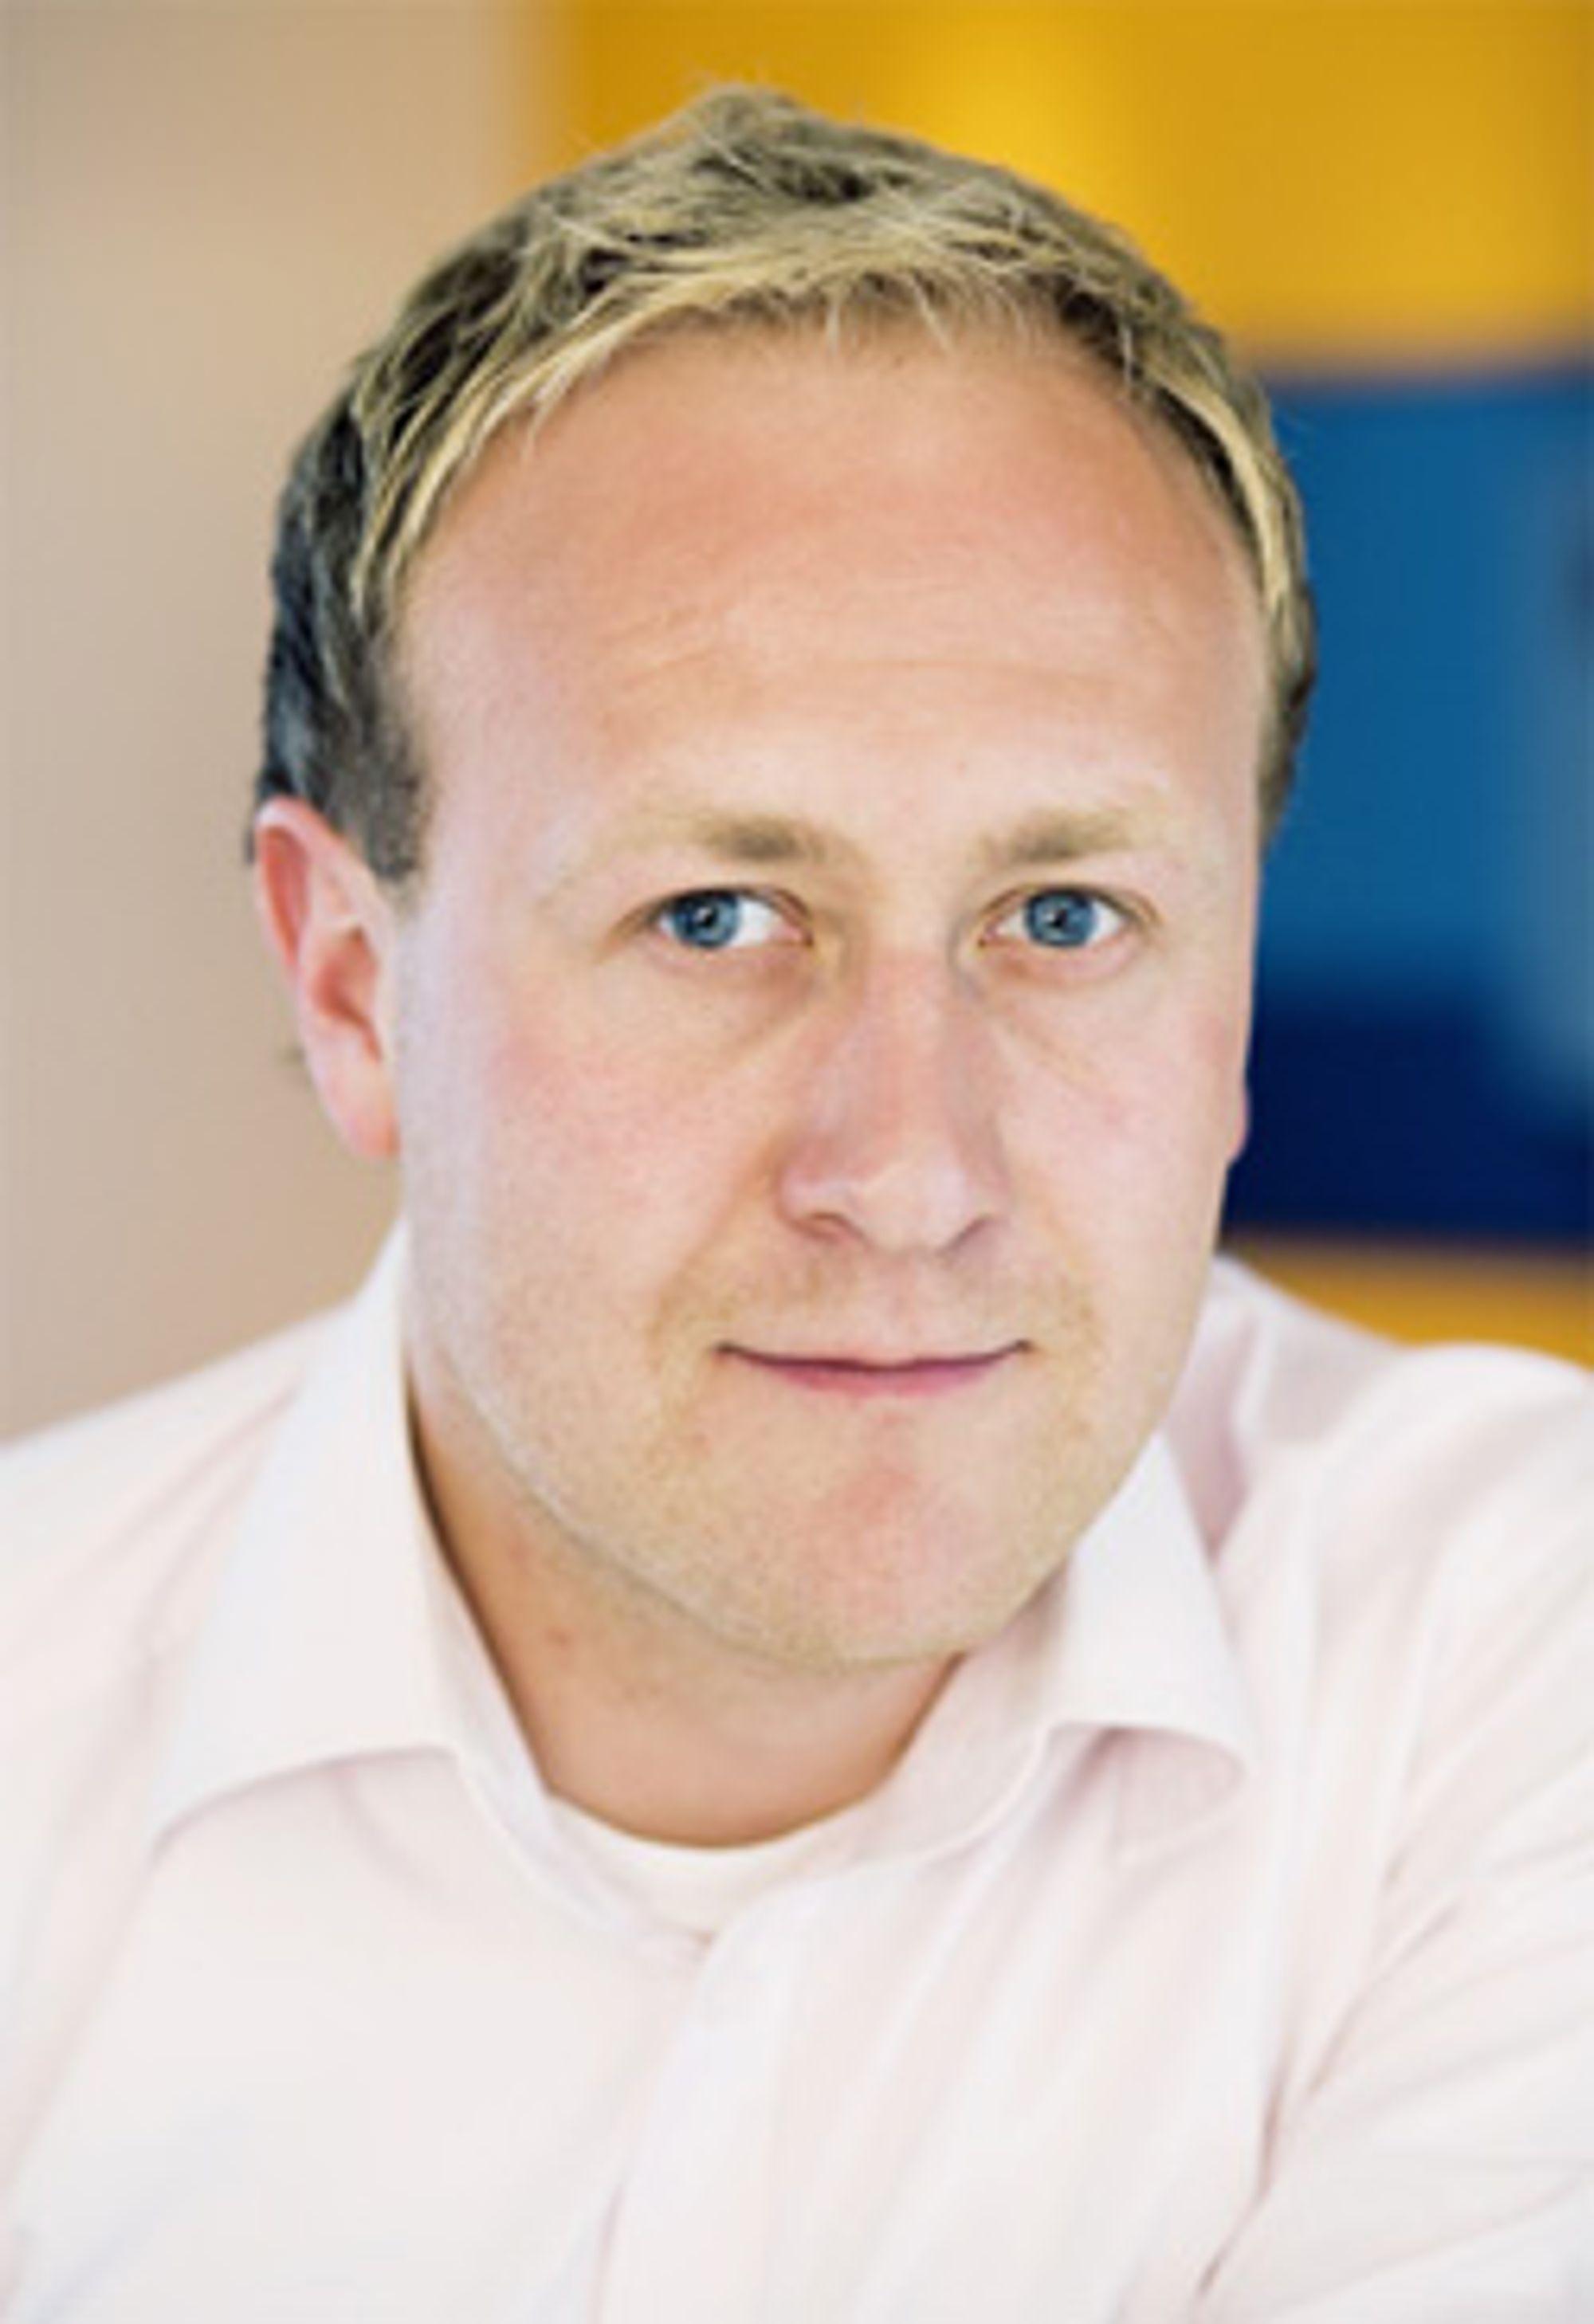 Øyvind Vederhus i Netcom lover også fastpris til privatkunder. (Foto: Netcom)